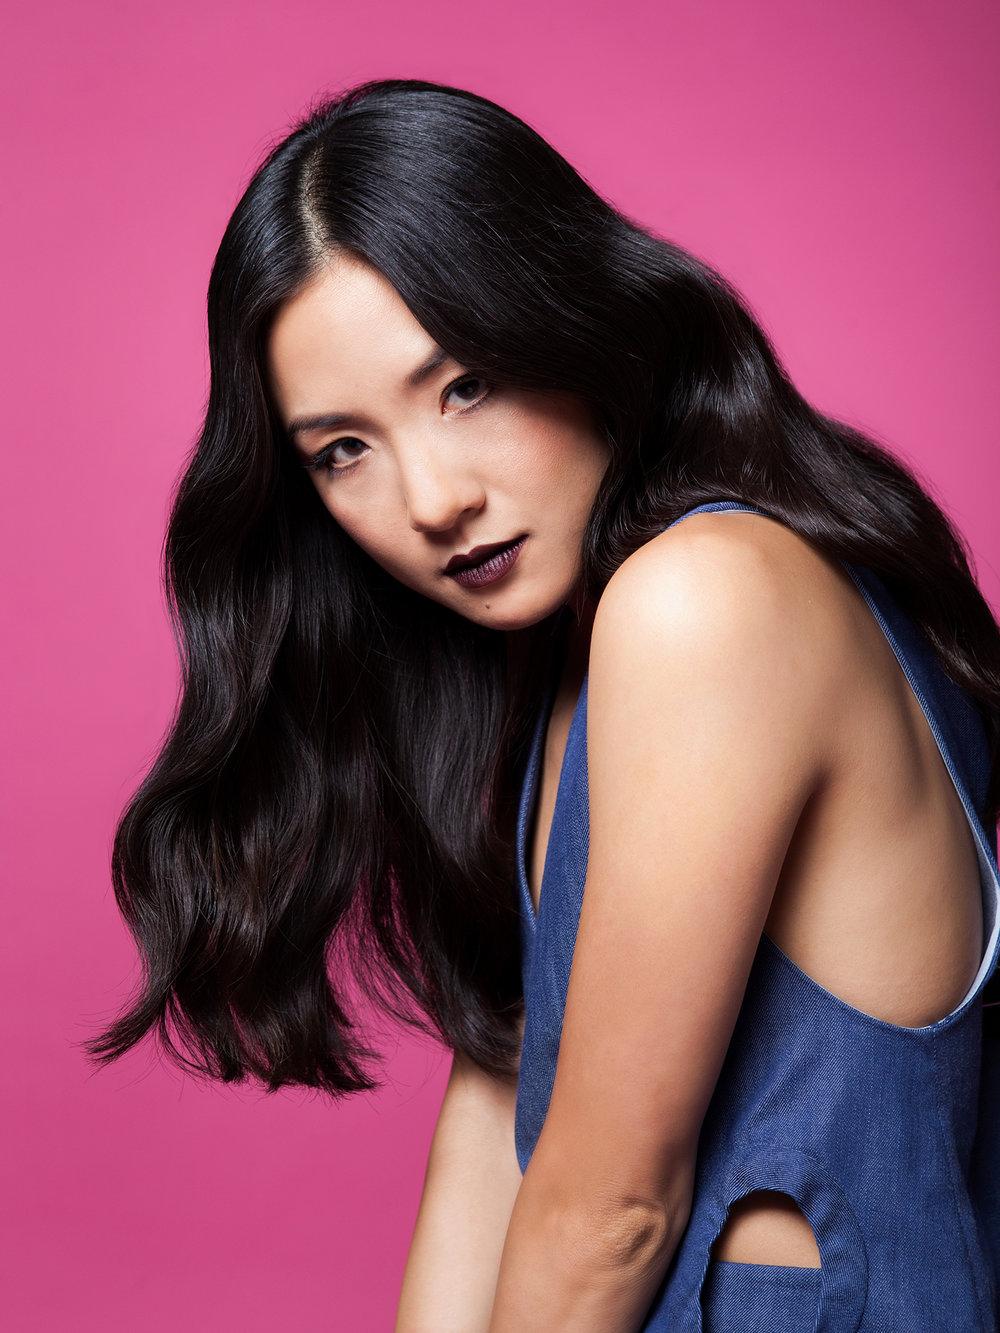 Constance Wu, Actress